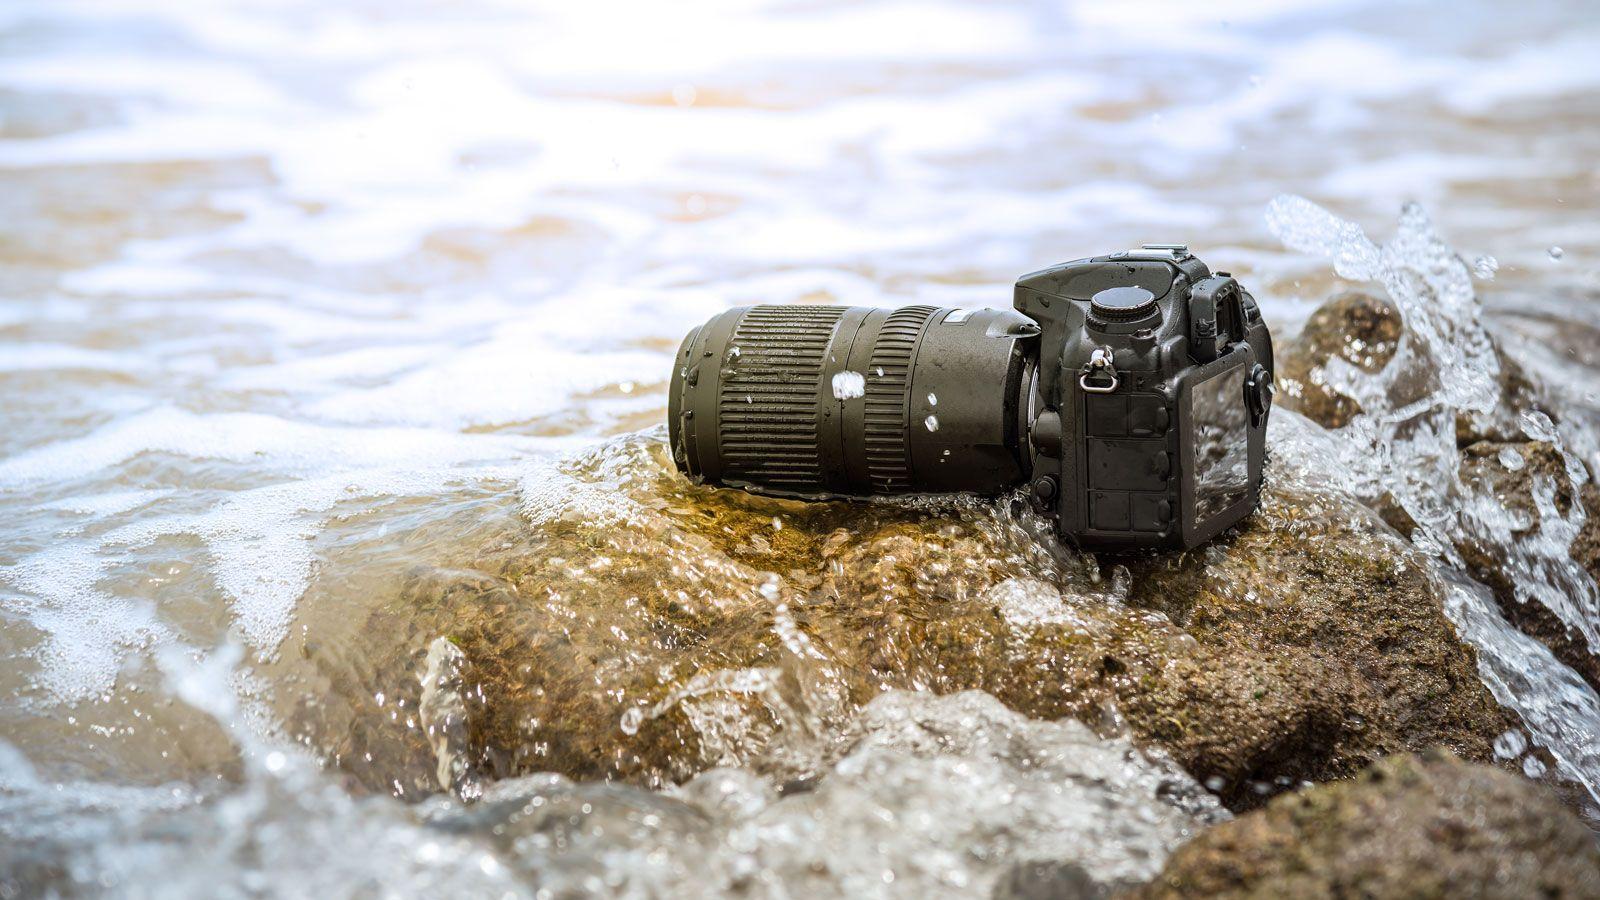 Best Waterproof Cameras 2020: The Best New Cameras For Underwater Exploring